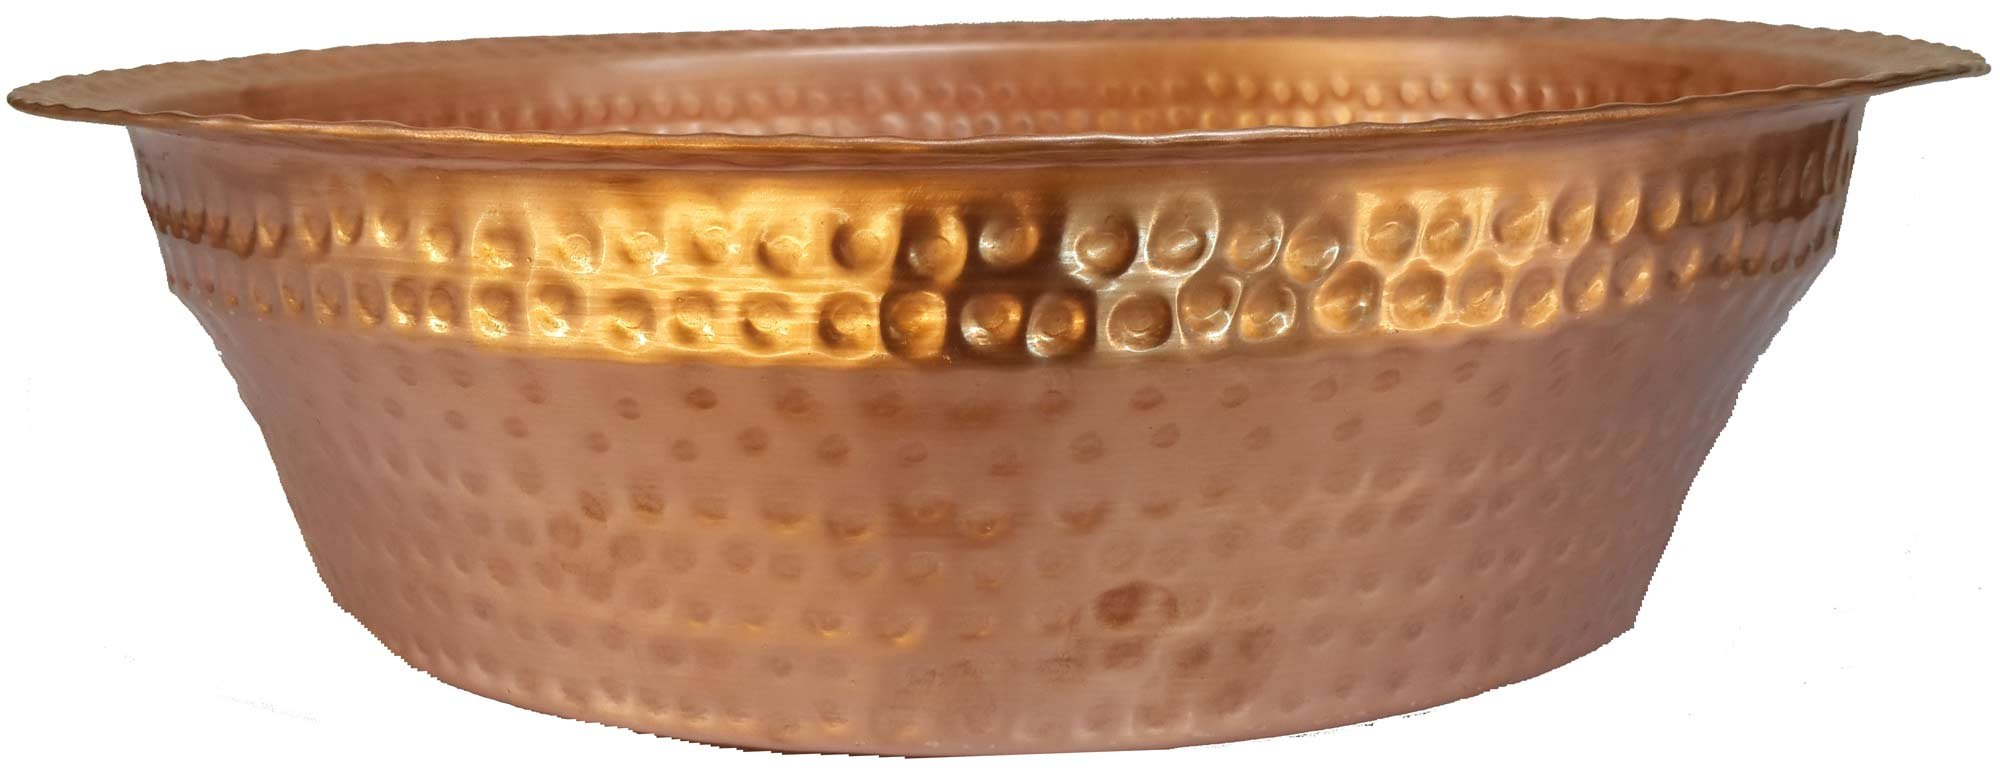 Egypt gift shops HAND MADE Polished Foot Bath Washing Soaking Massage Spa Pedicure Bucket Leg Toes Care Manicure Bowl by Egypt gift shops (Image #3)